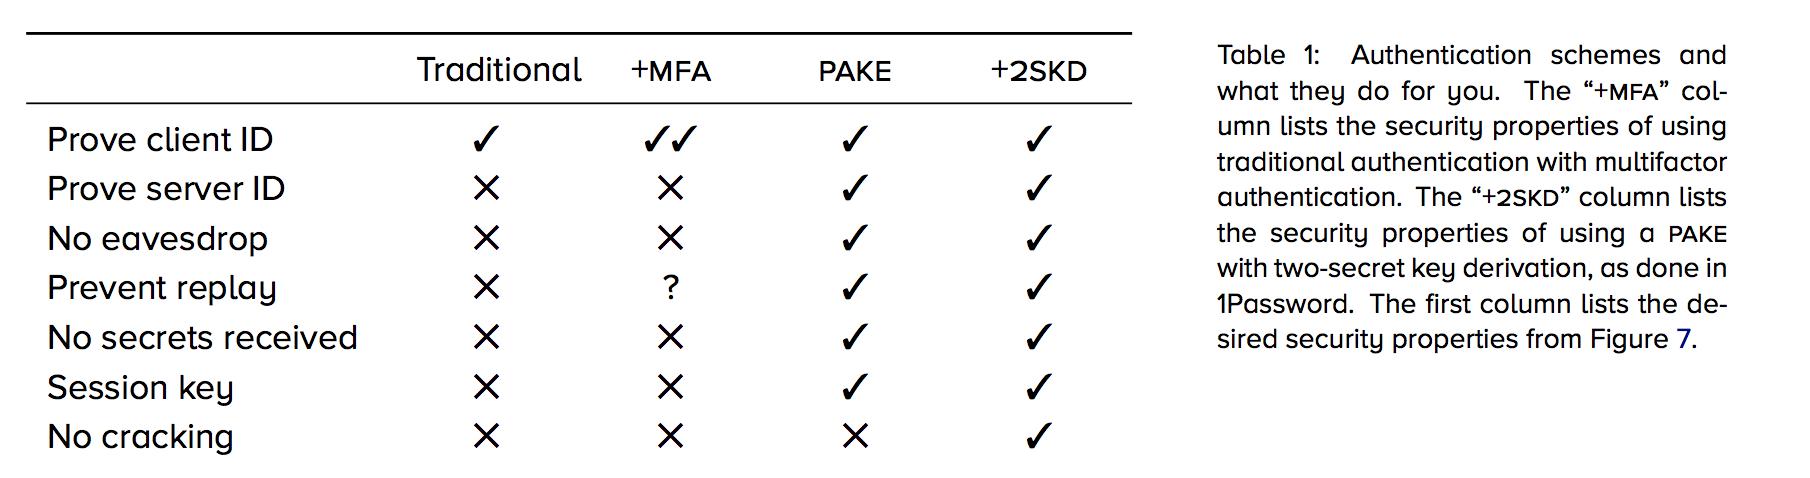 Authentication schemes compared